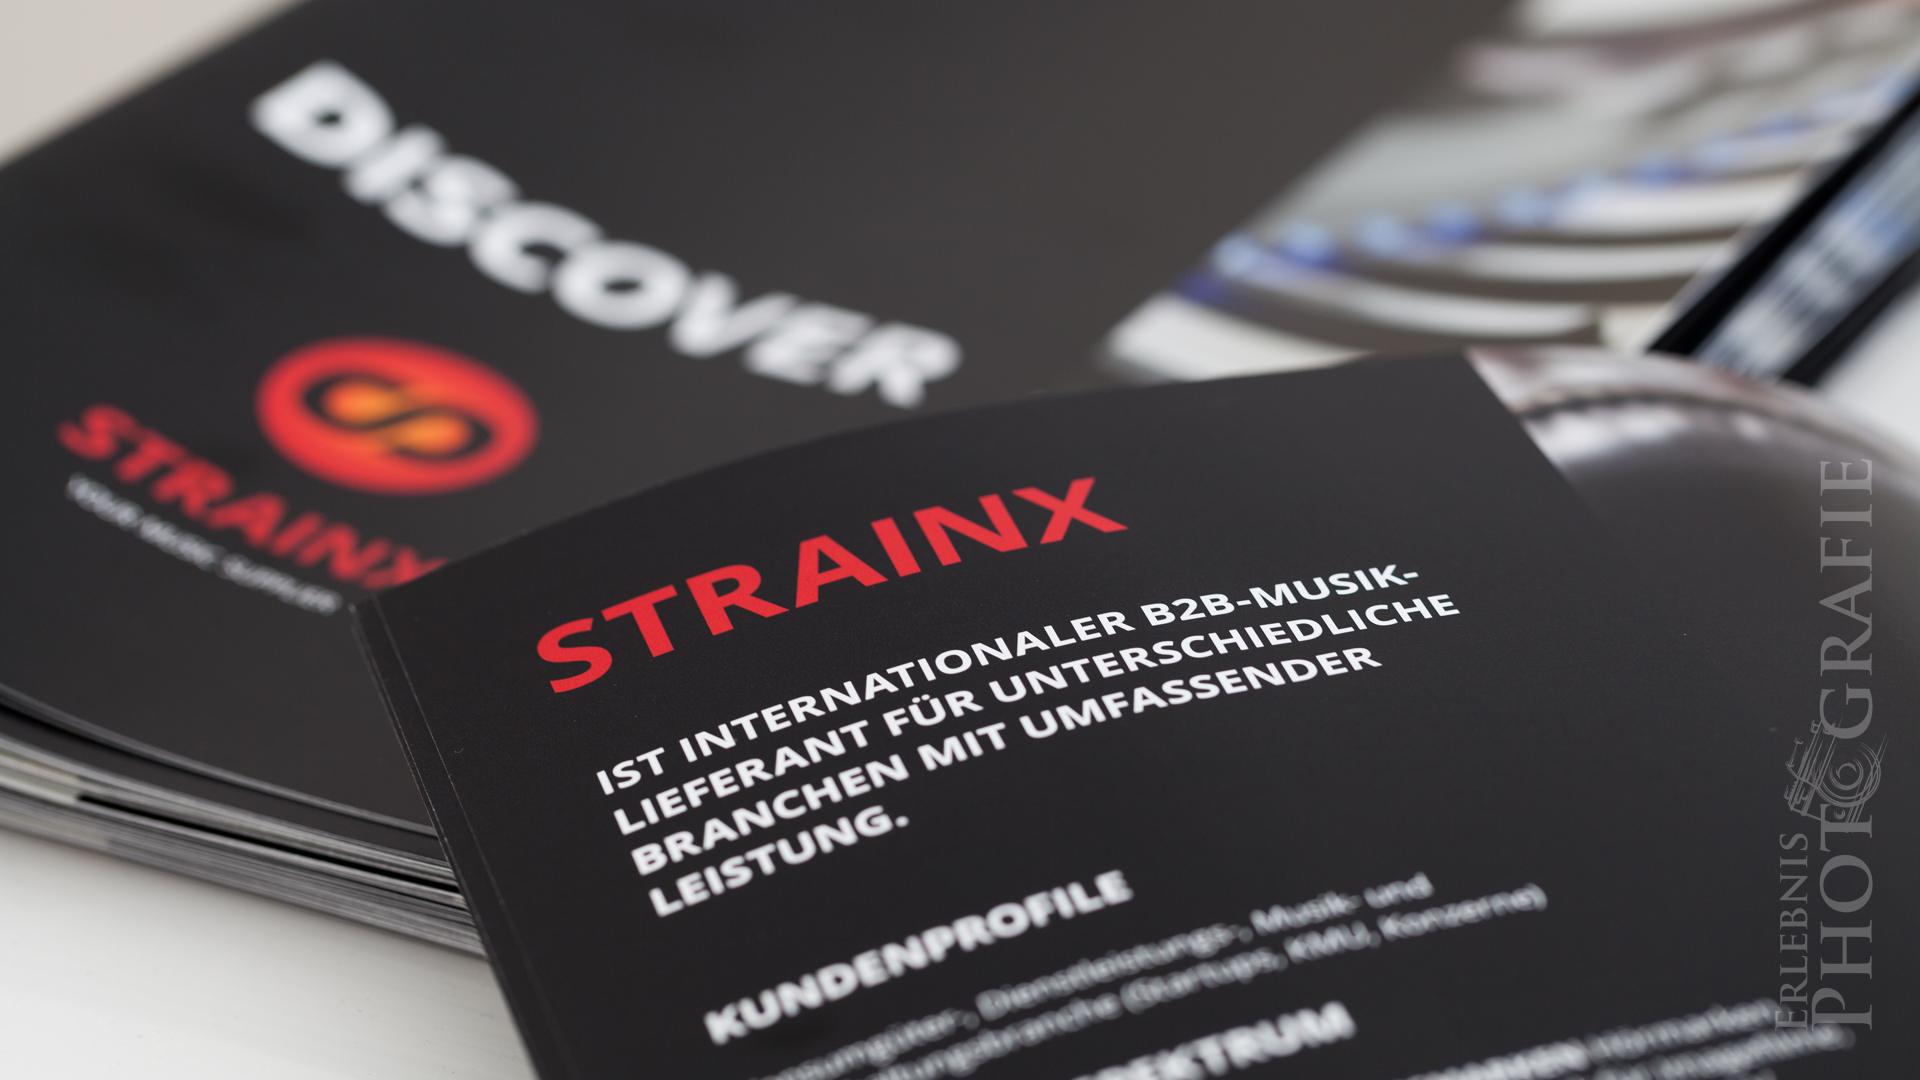 Fotostudio, Fotograf, Bremen, Unternehmen, Werbung, Marketing, Imagebroschüre